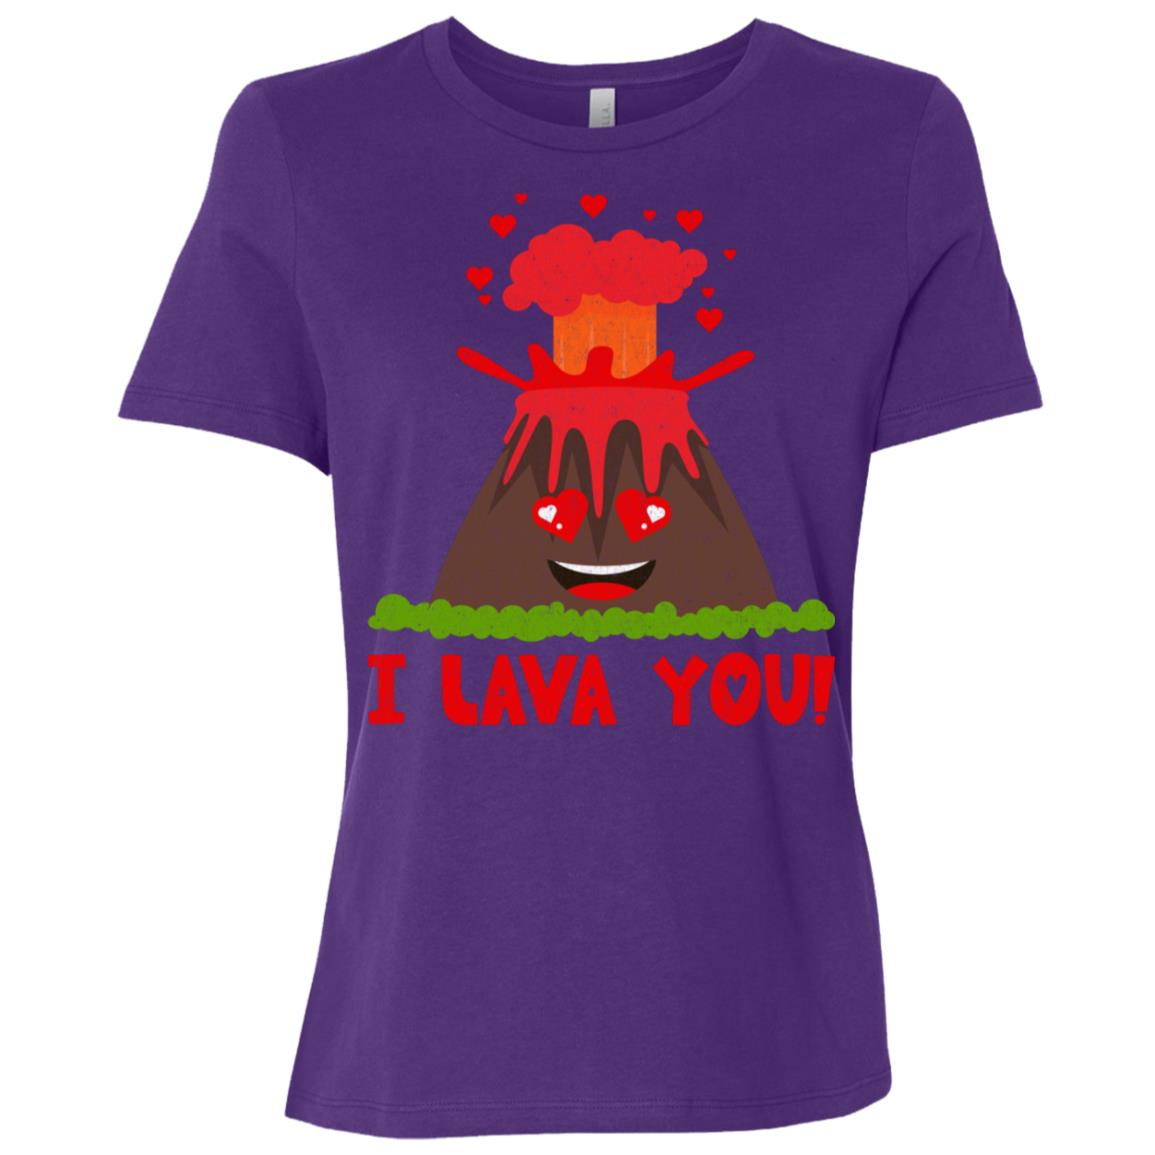 I Lava You – Funny Love Pun Women Short Sleeve T-Shirt